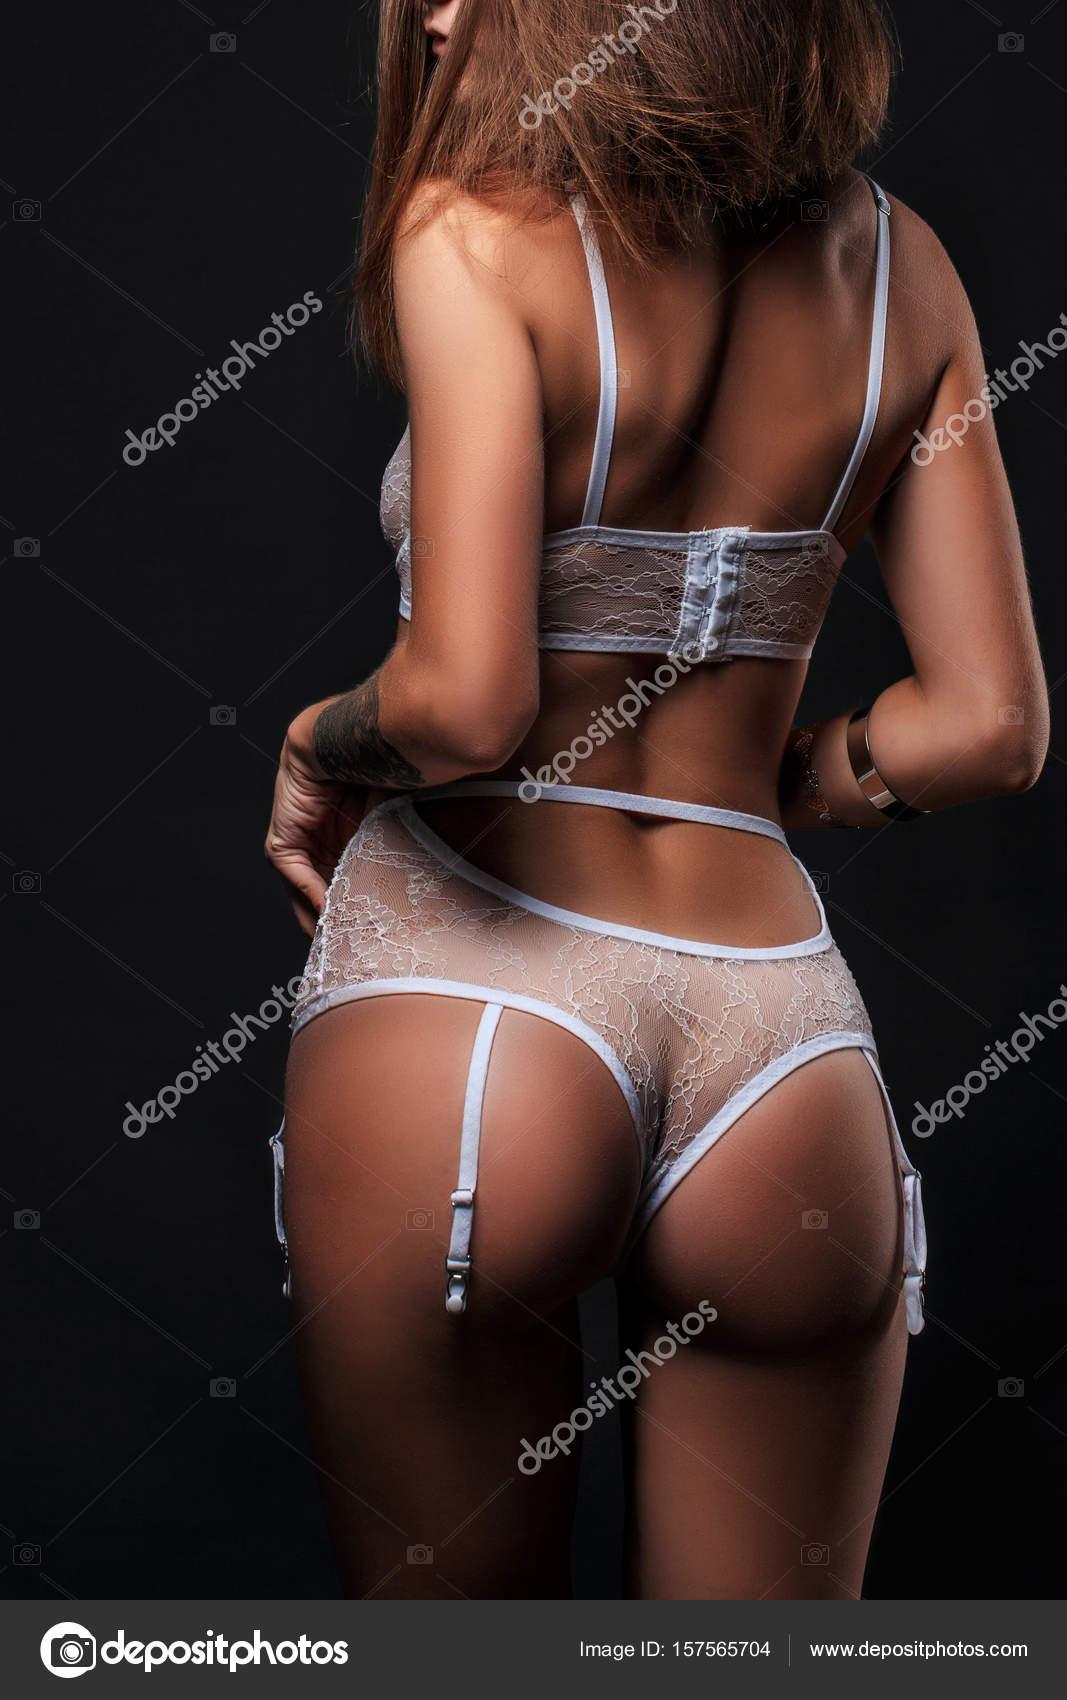 NUD σέξι φωτογραφίες μεγάλες μαύρες γραβάτες πορνό